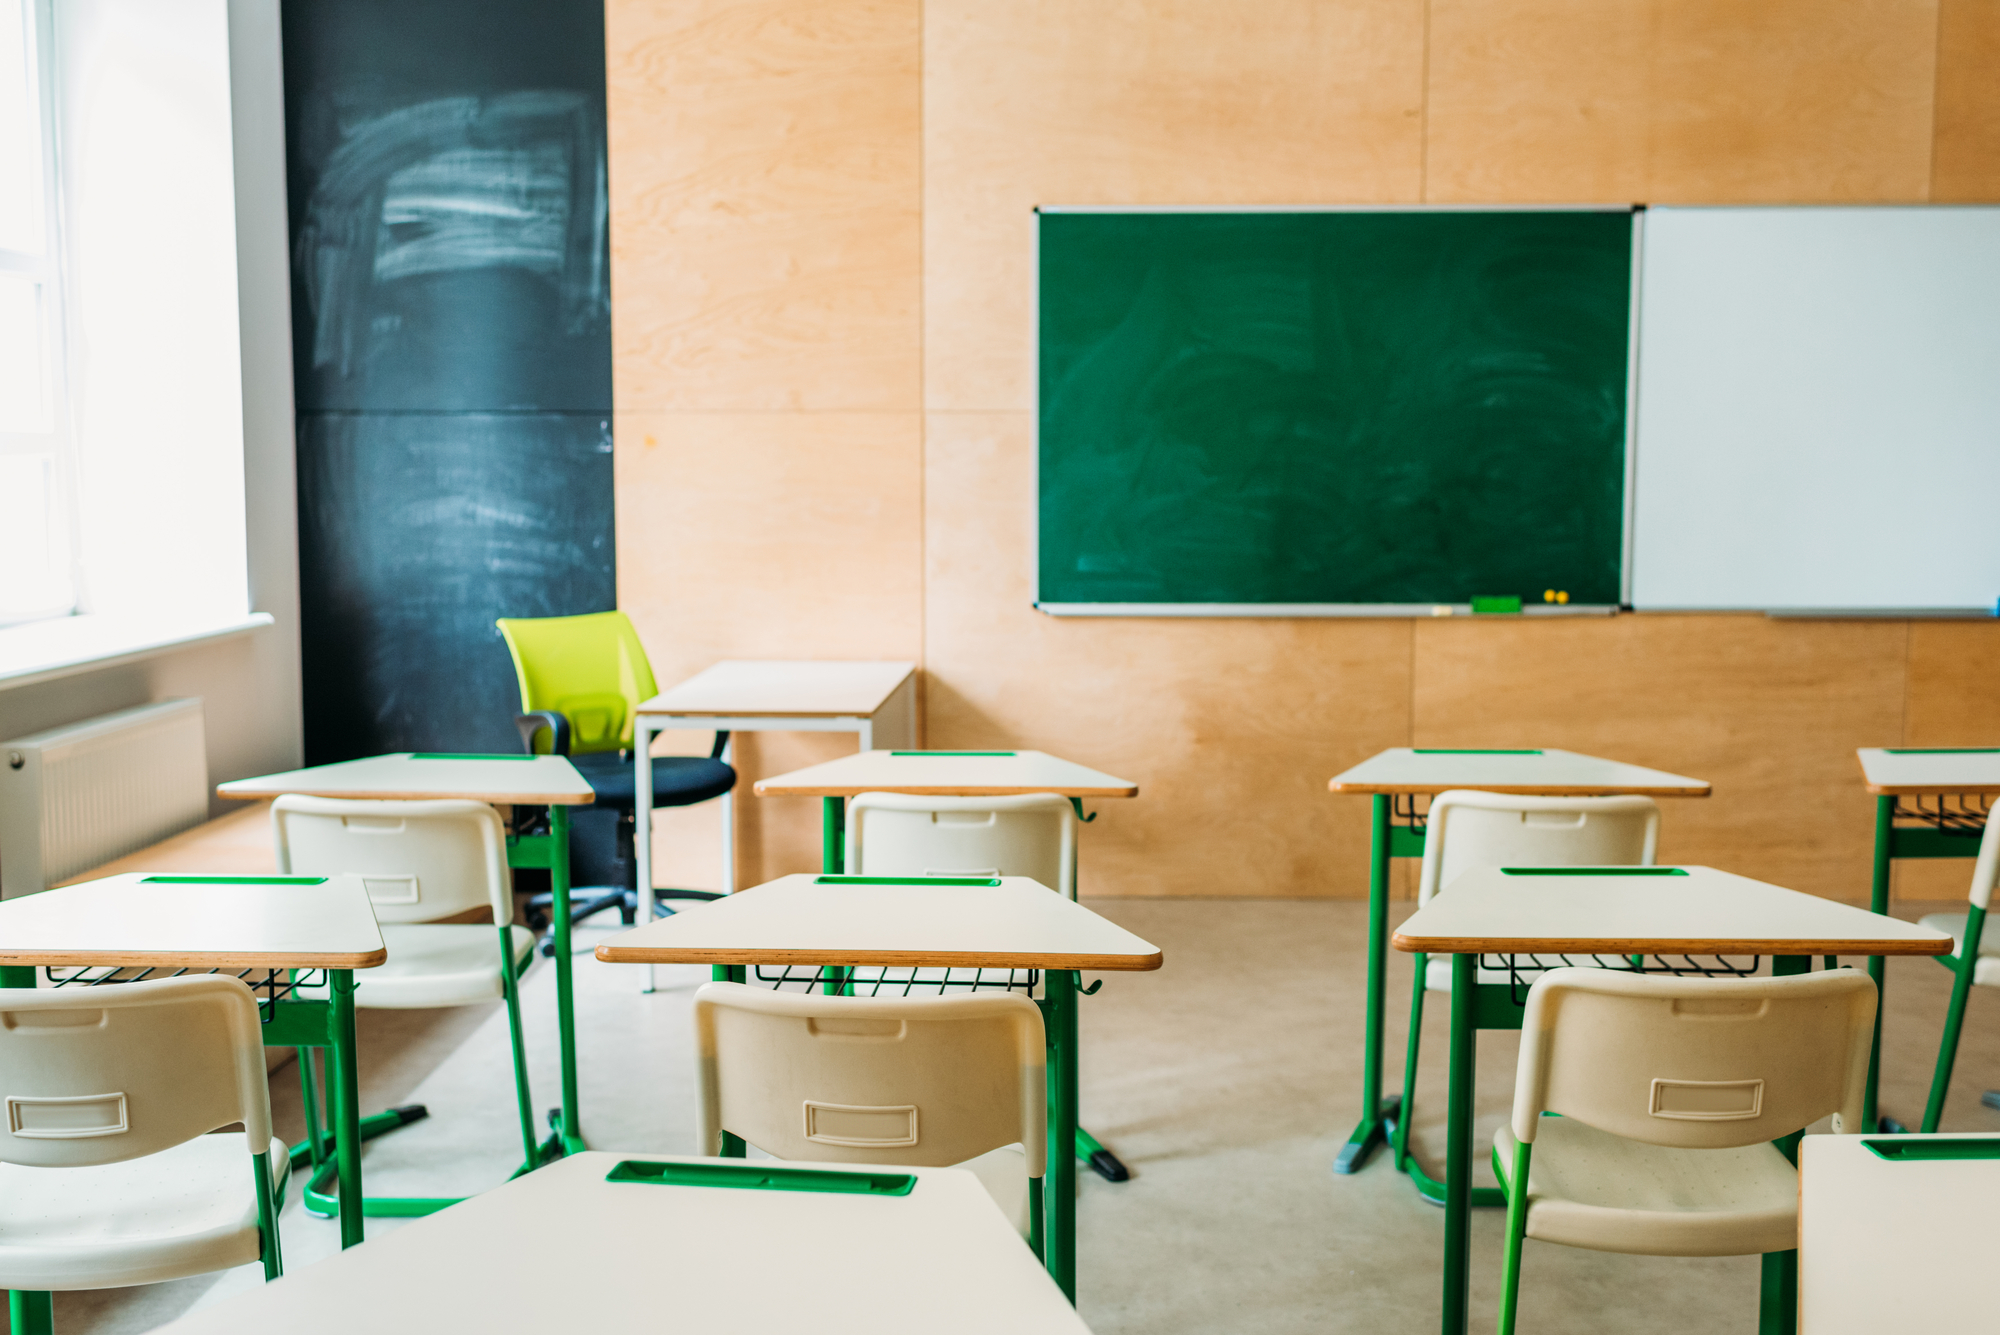 Interior of empty modern classroom with blank chalkboard at school